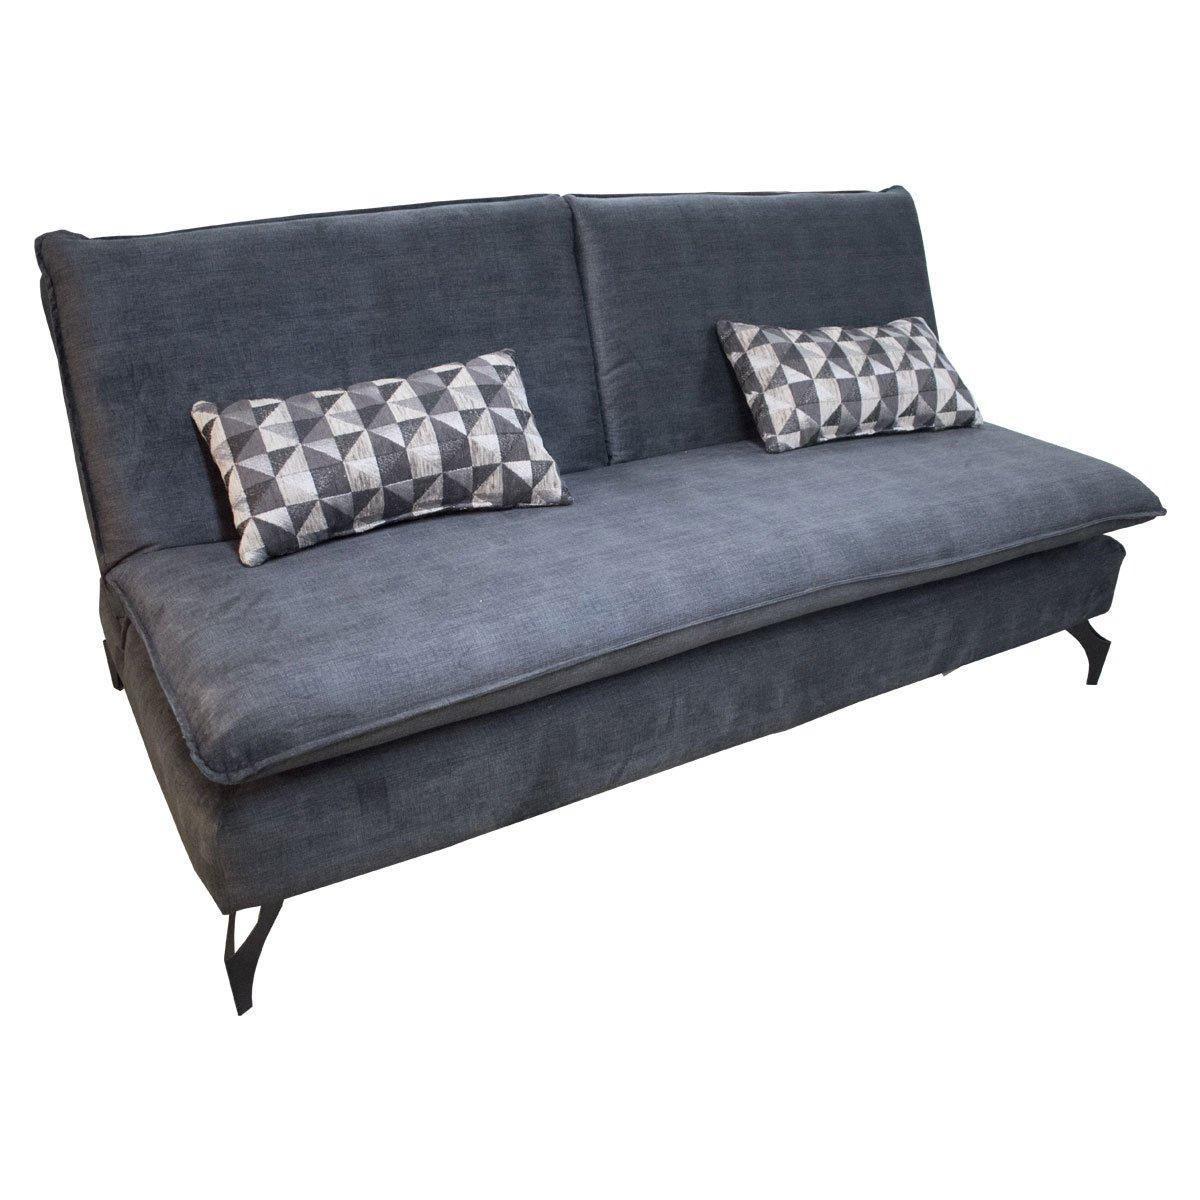 abrir sofa cama beddinge fabric protection sofá val violanti sears com mx me entiende